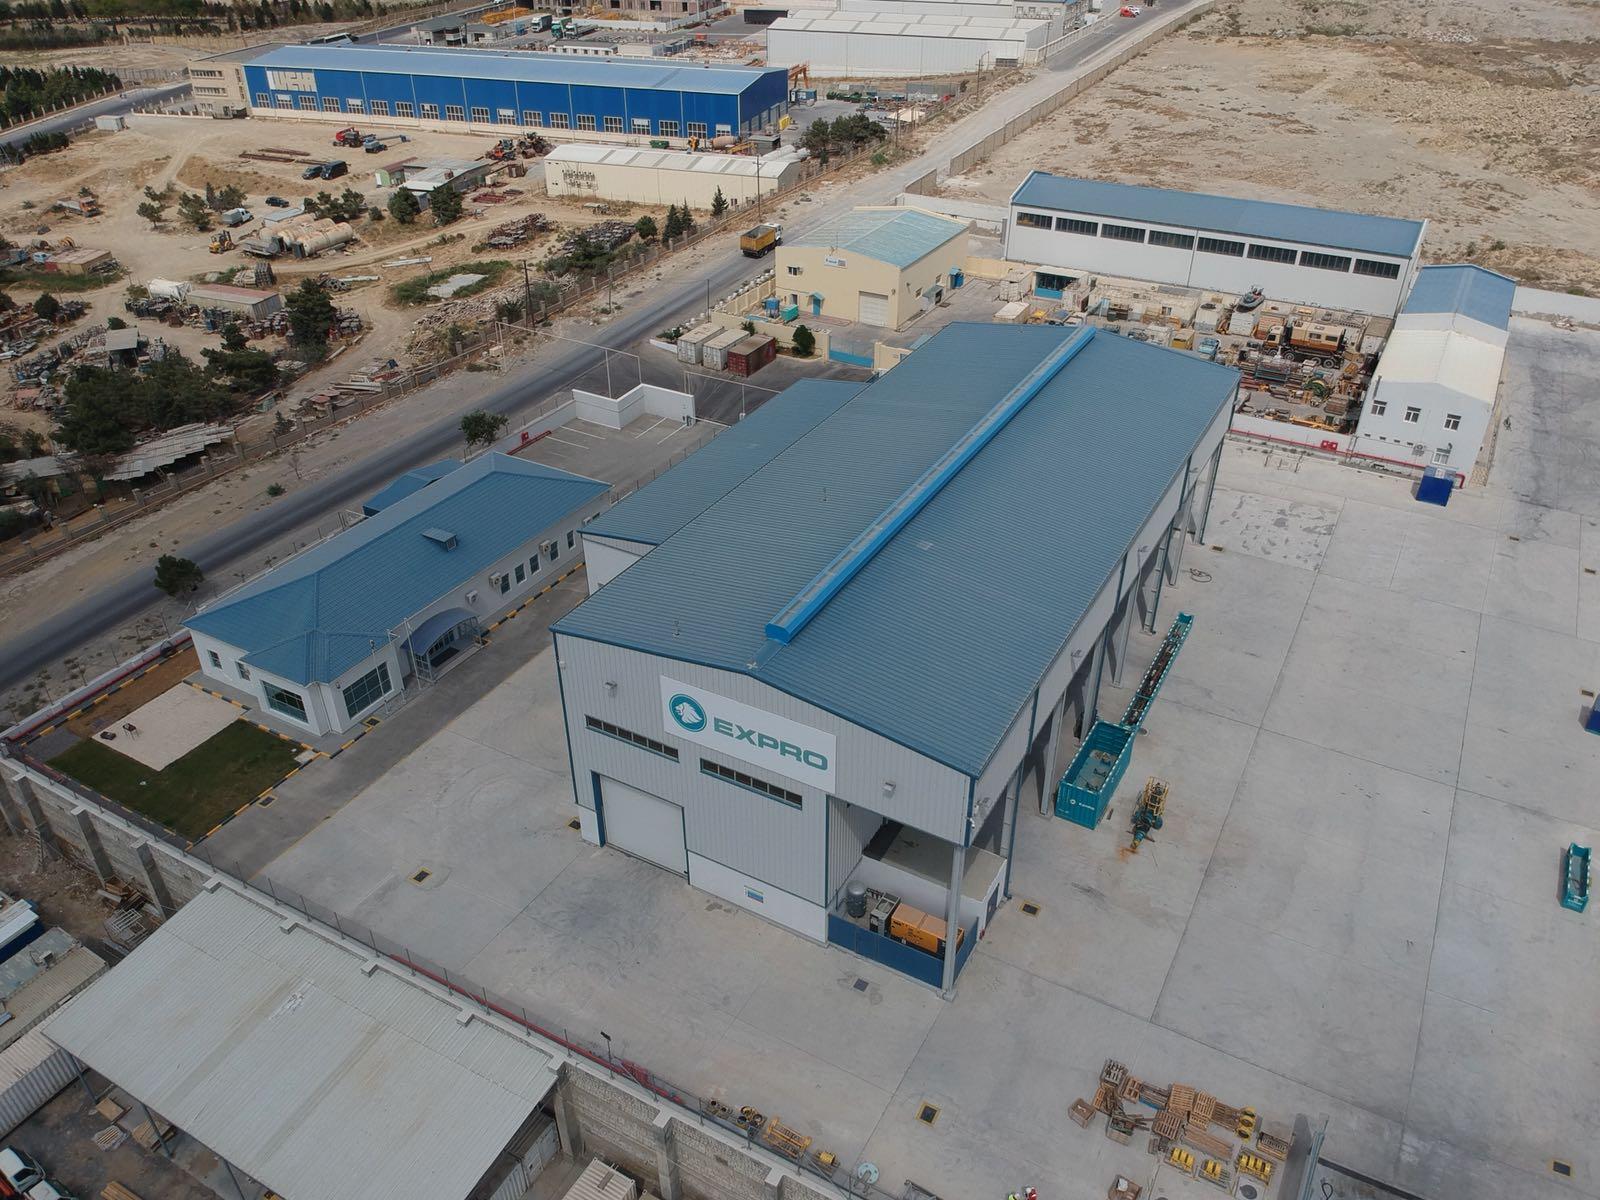 Expro's new purpose-built facility in Baku